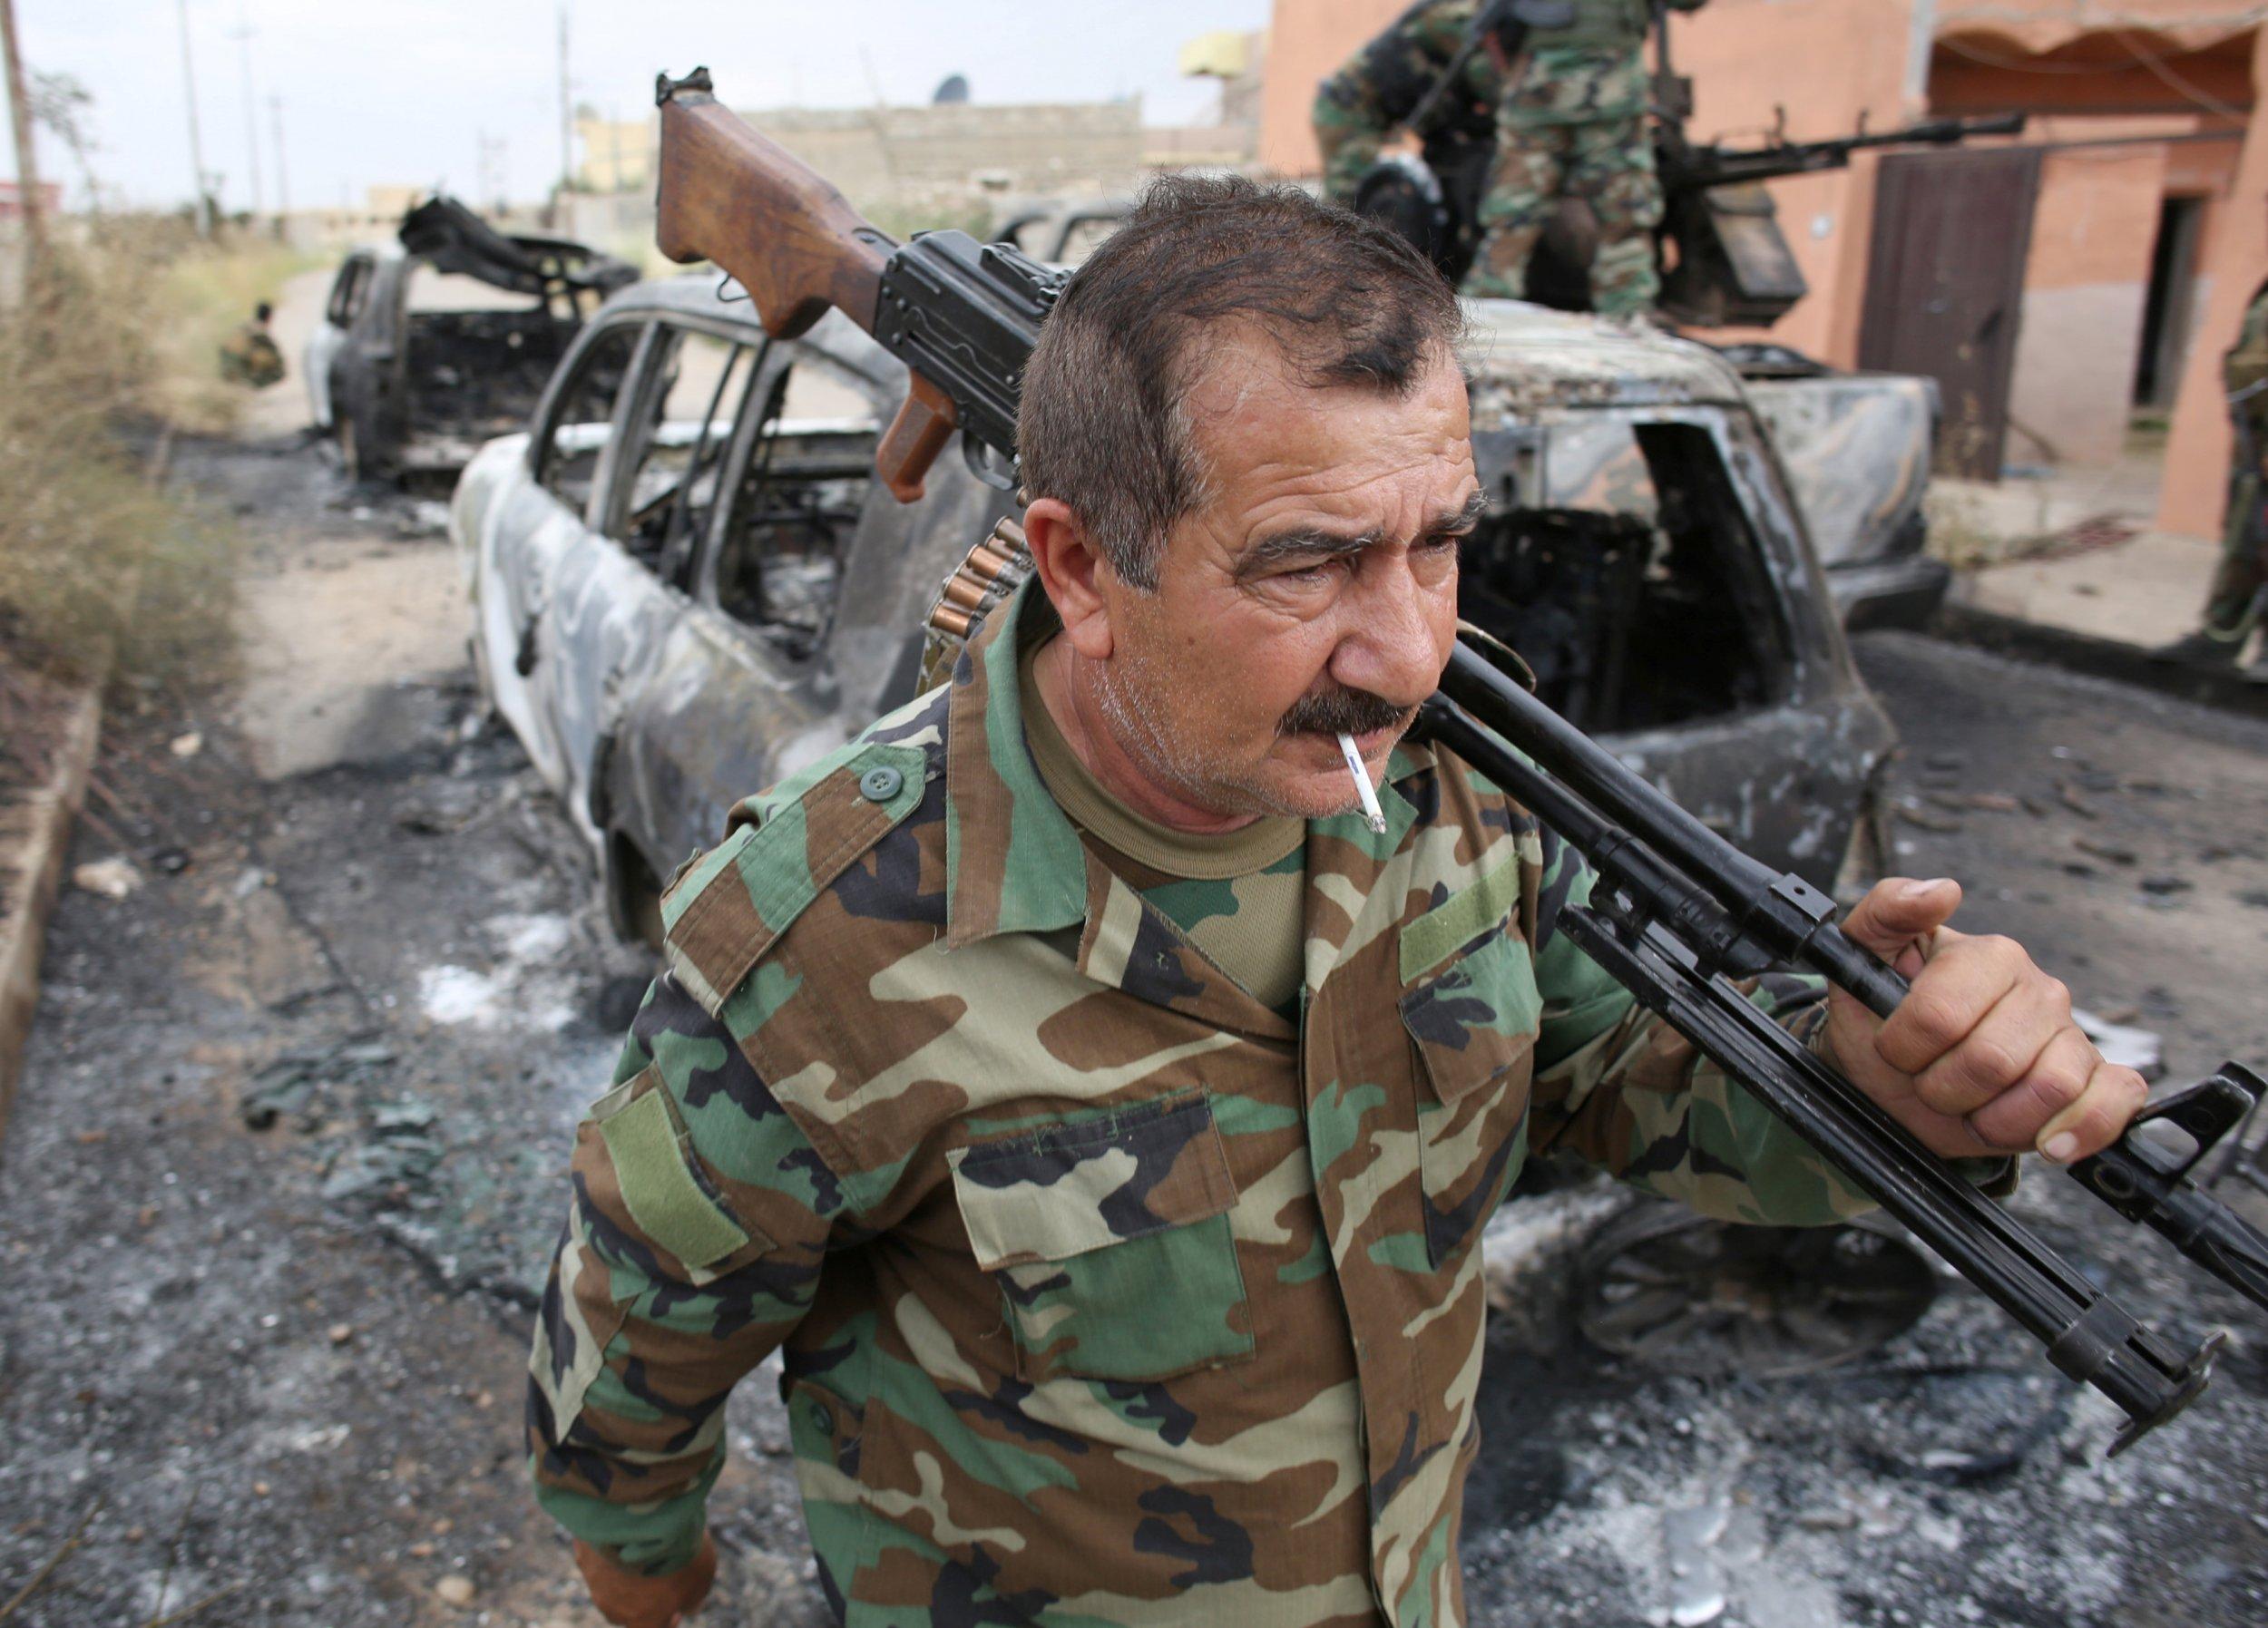 05_29_Peshmerga_Mosul_01